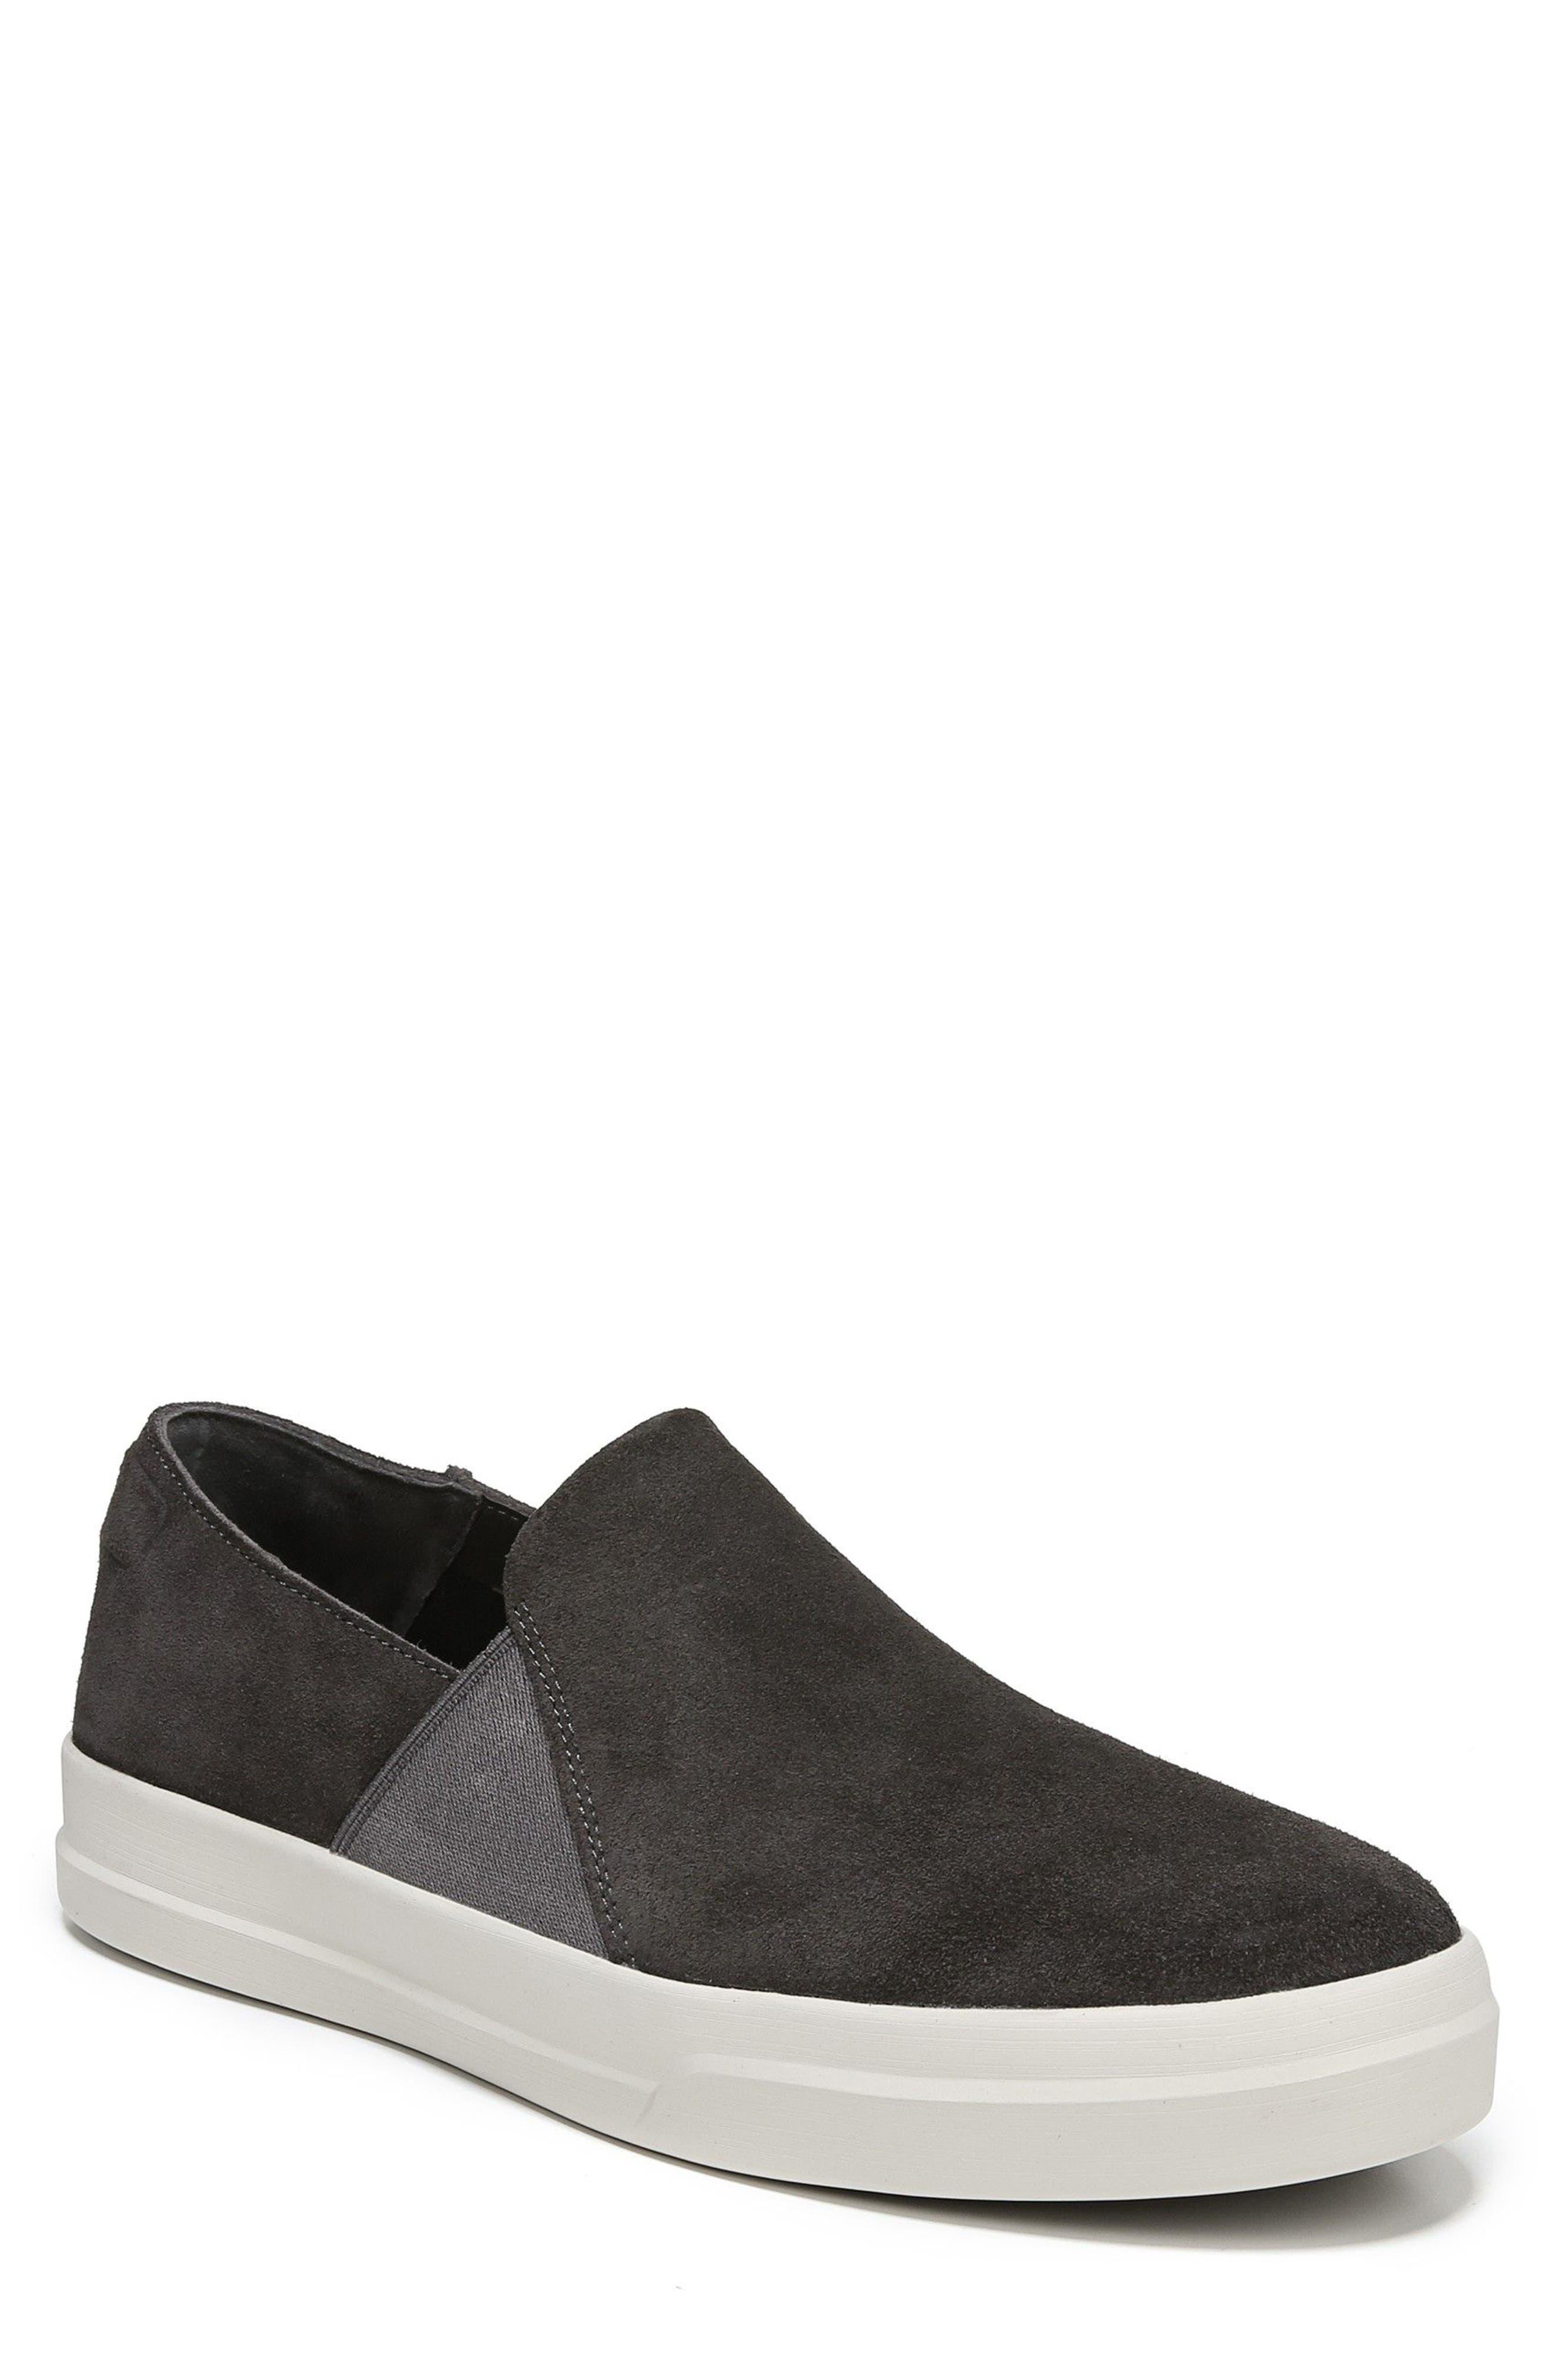 Carlin Slip-On Sneaker,                         Main,                         color, Graphite